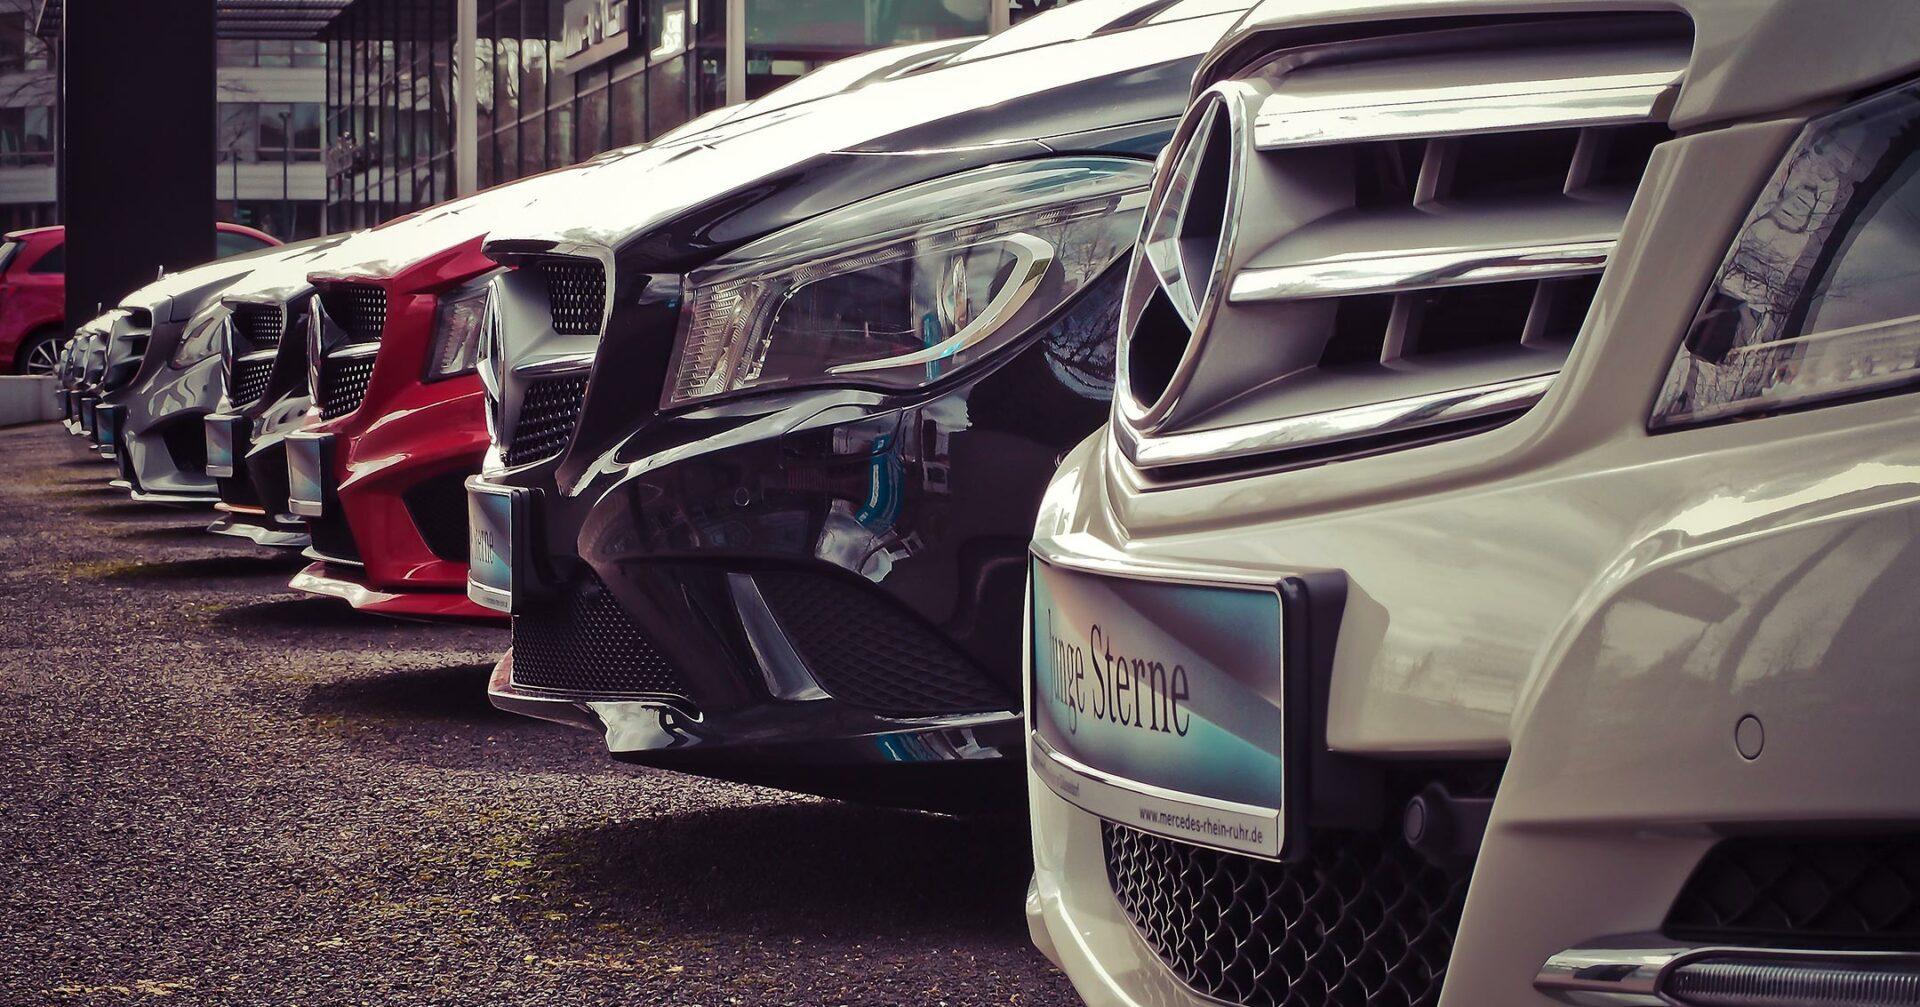 luxury car dealership lot photo